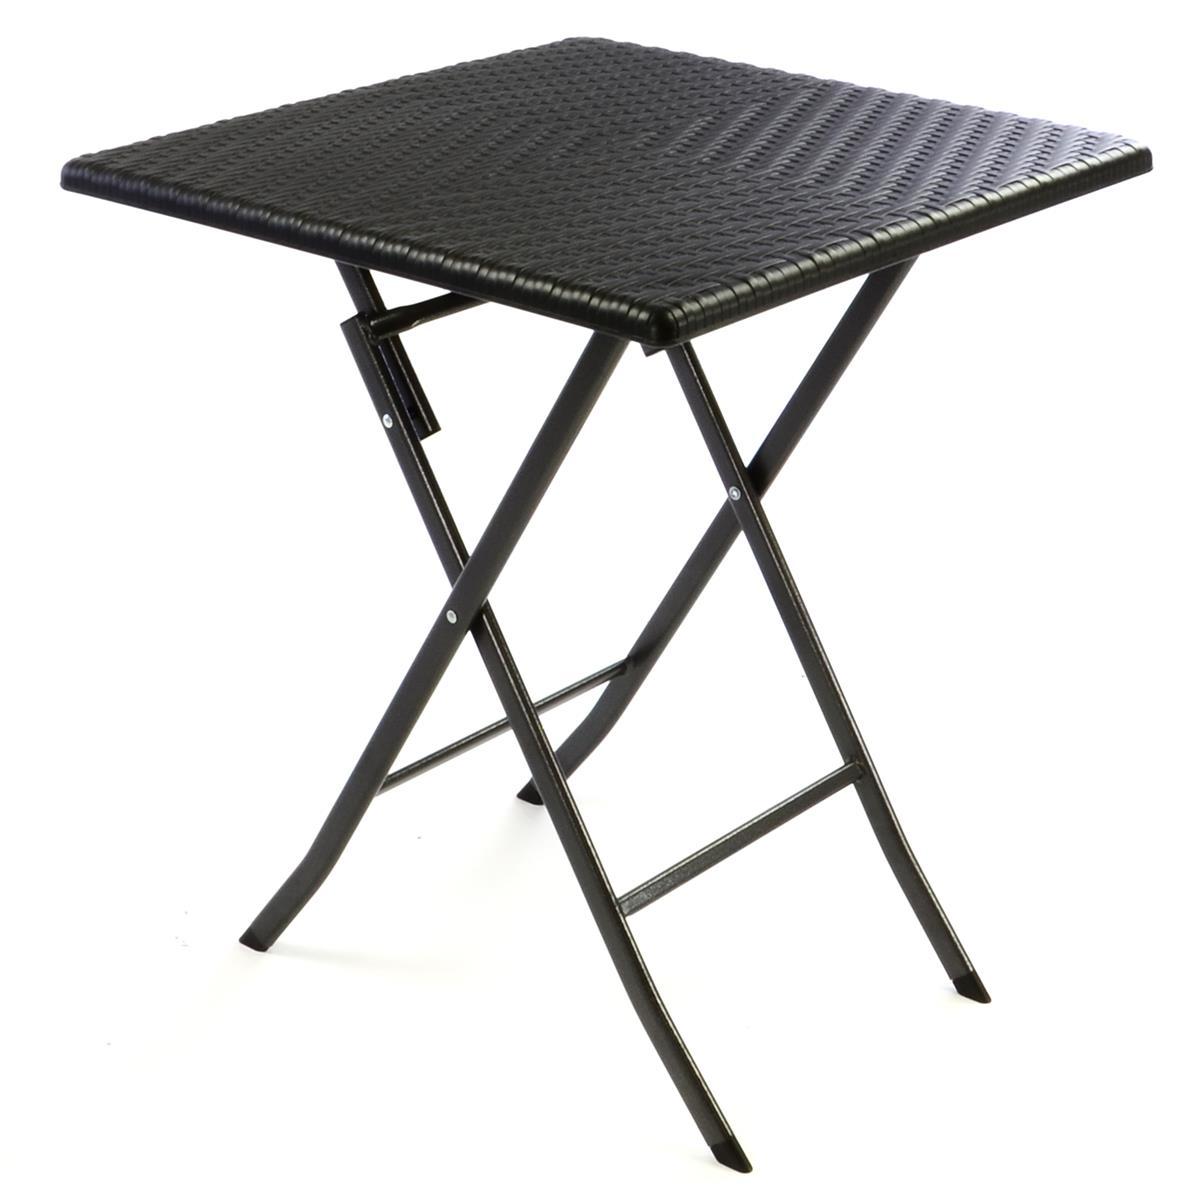 Tisch in Rattan Optik Balkontisch Gartentisch 75 x 61 x 61